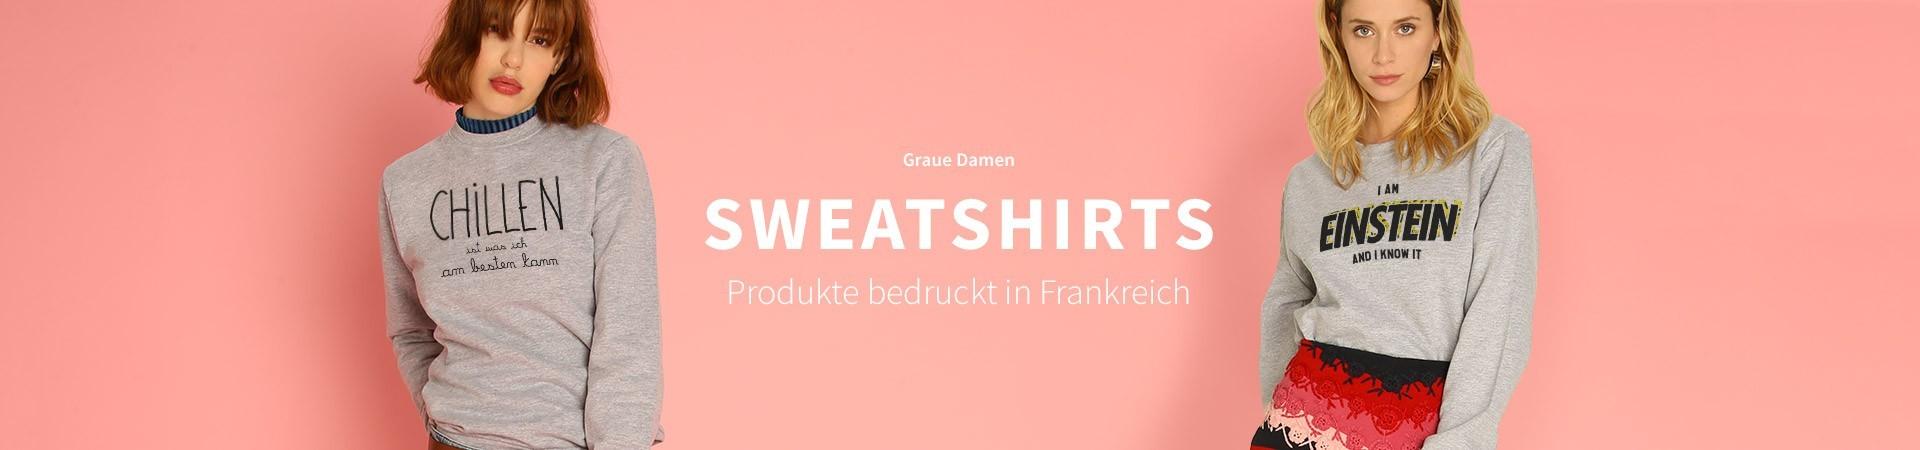 Graue Sweatshirts